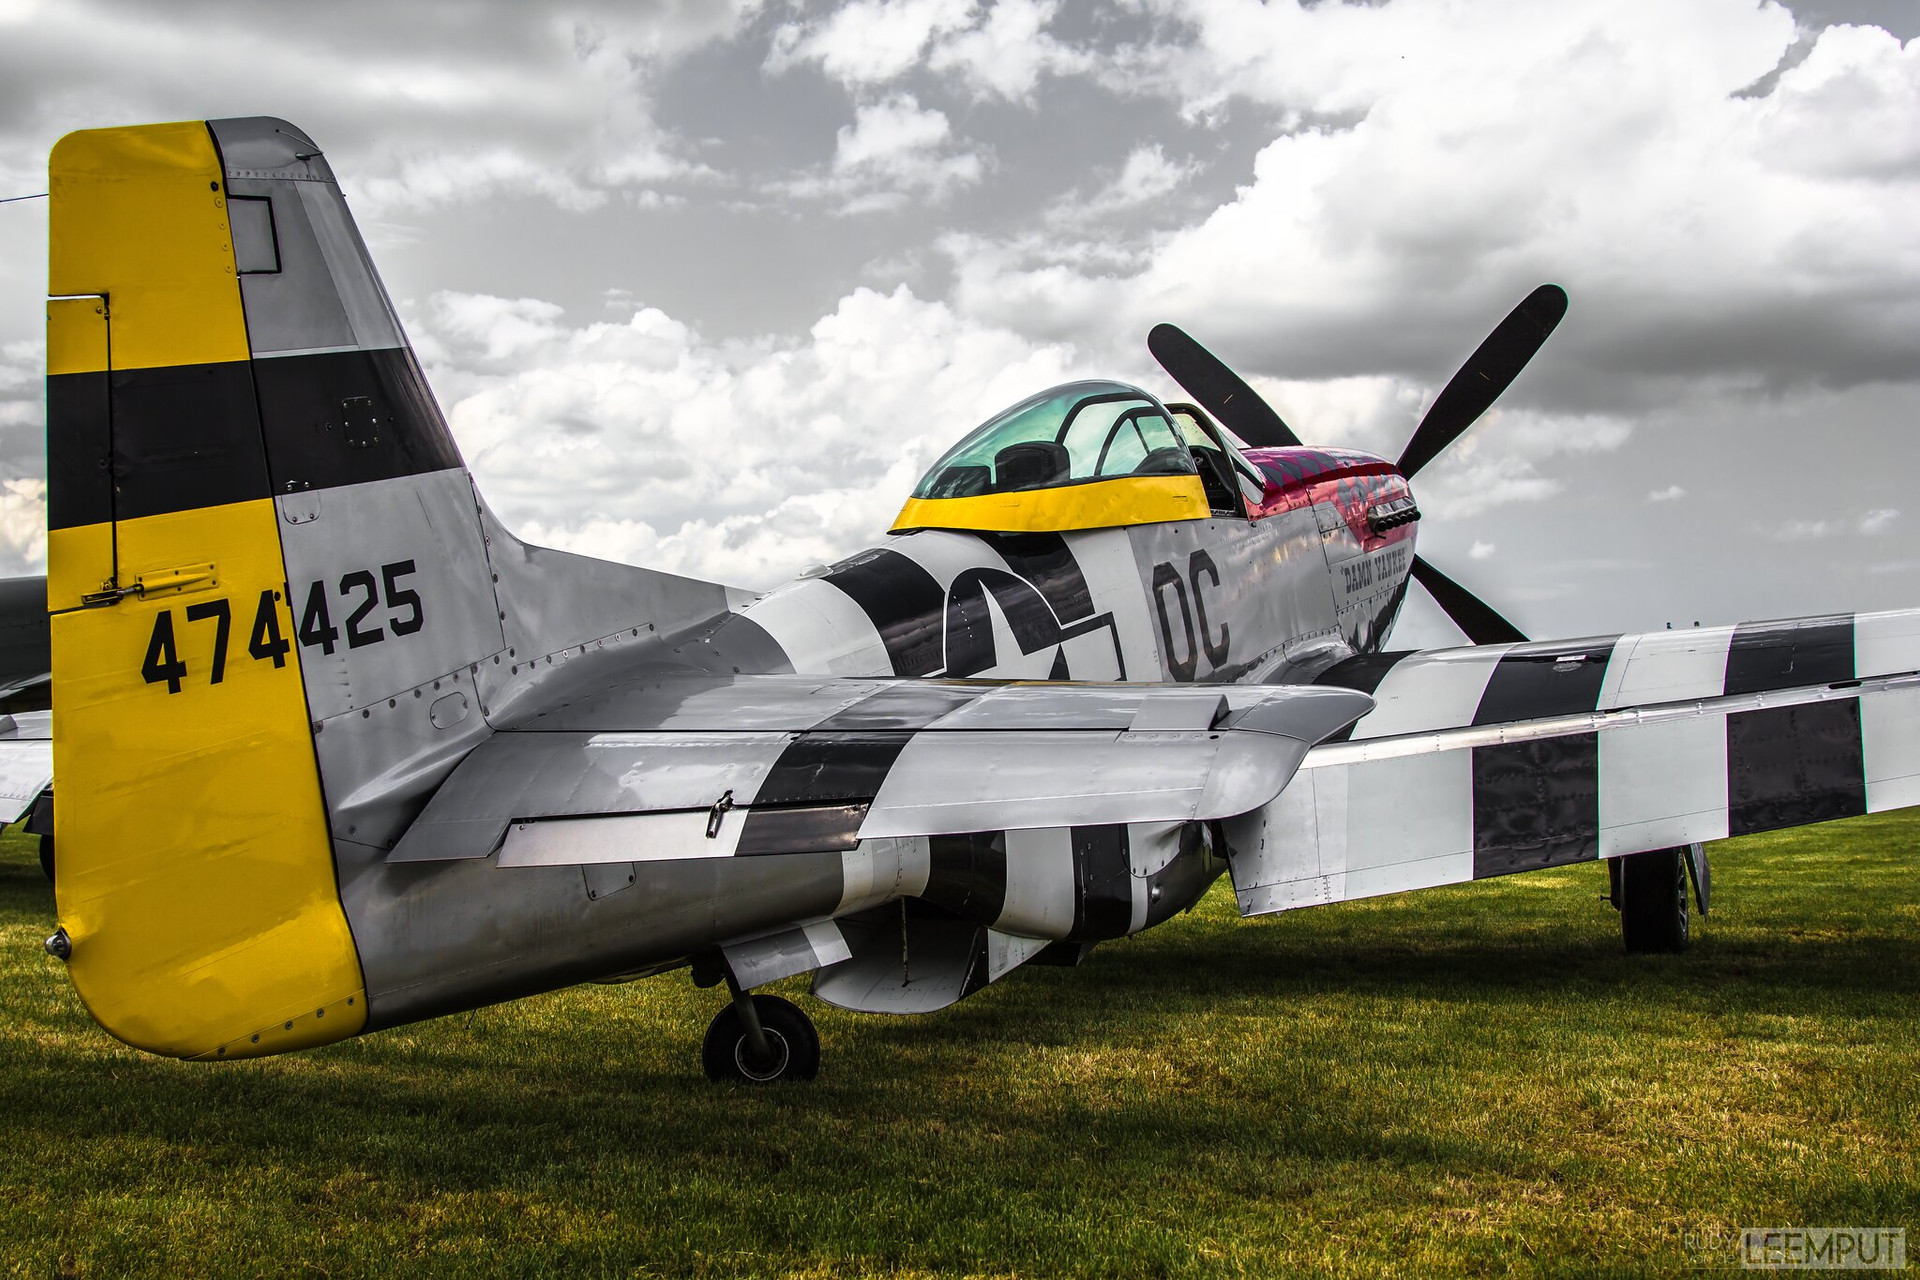 "474425 / PH-PSI   Build: 1947 - North American P-51D-30NA Mustang ""Damn Yankee"""